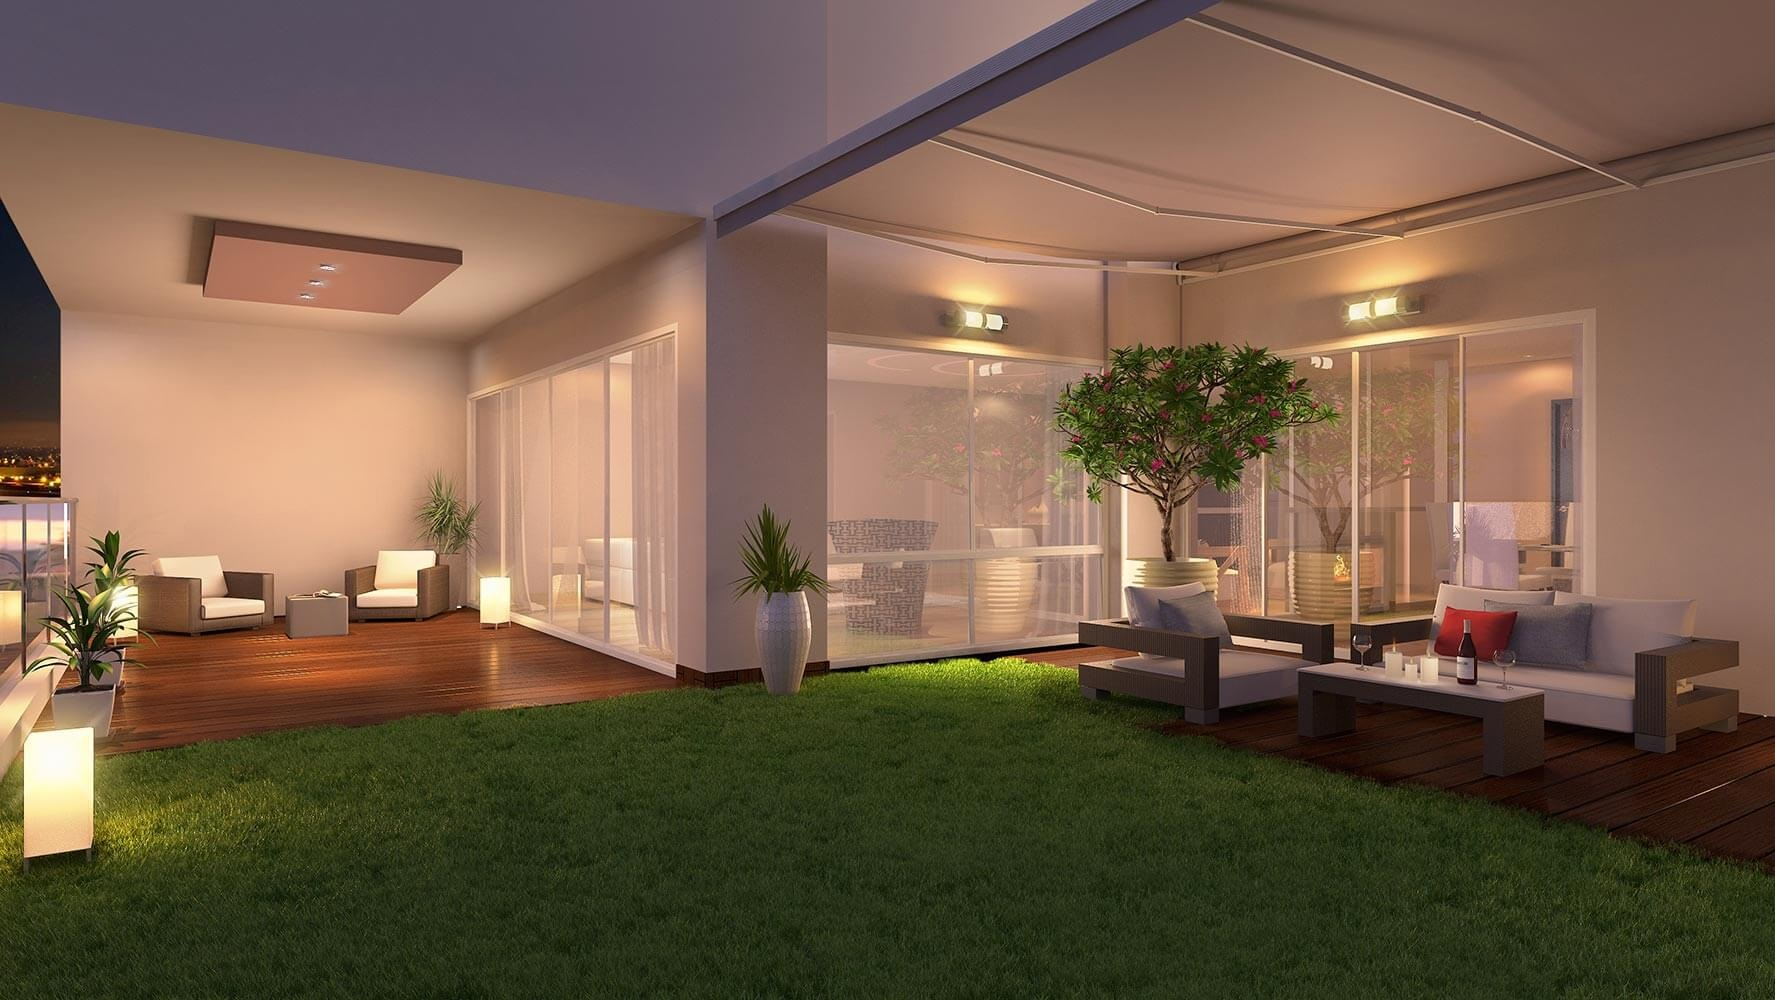 amar westview project amenities features4